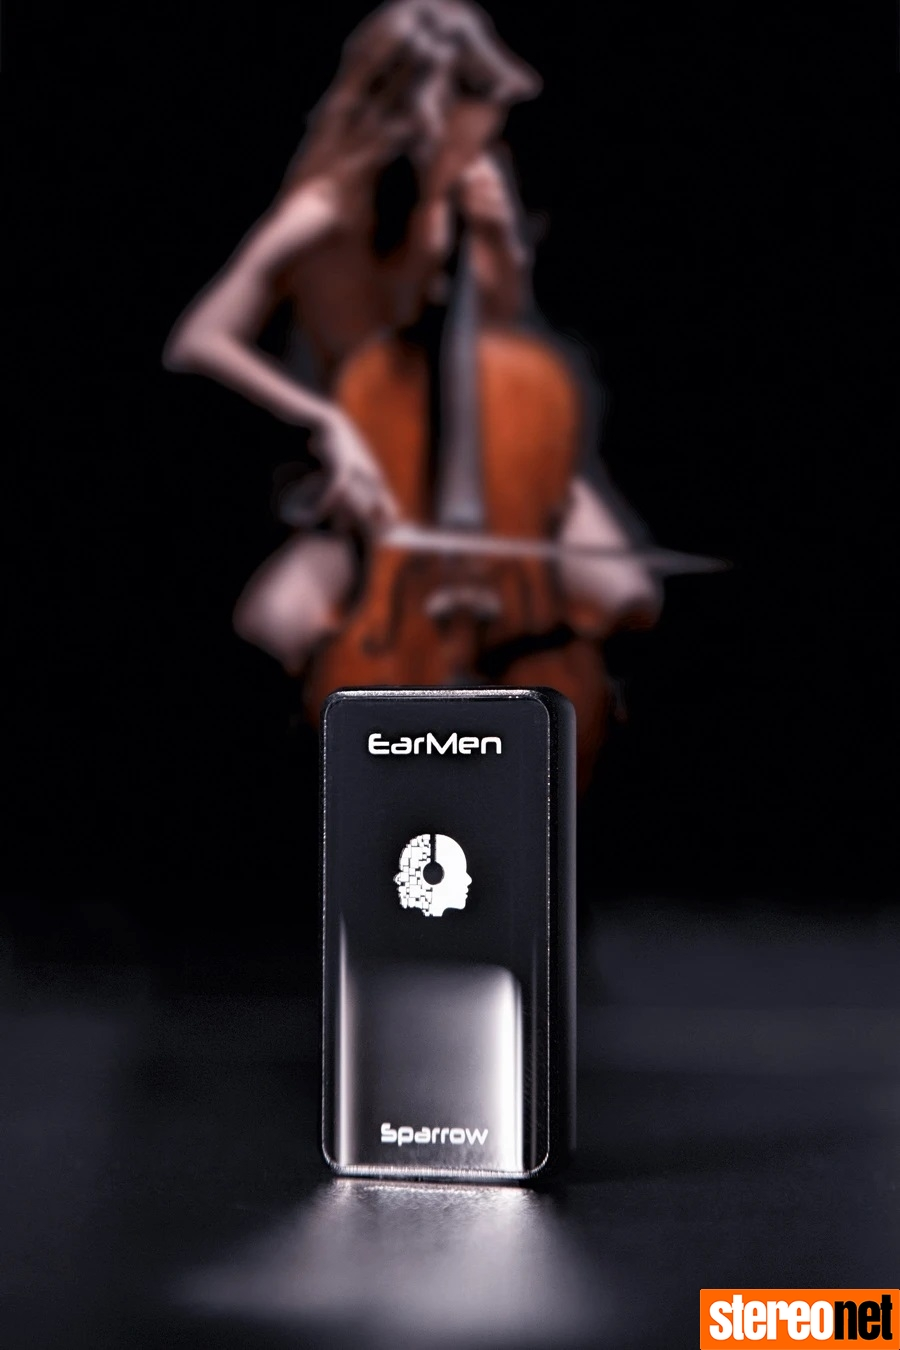 EarMen Sparrow DAC Review